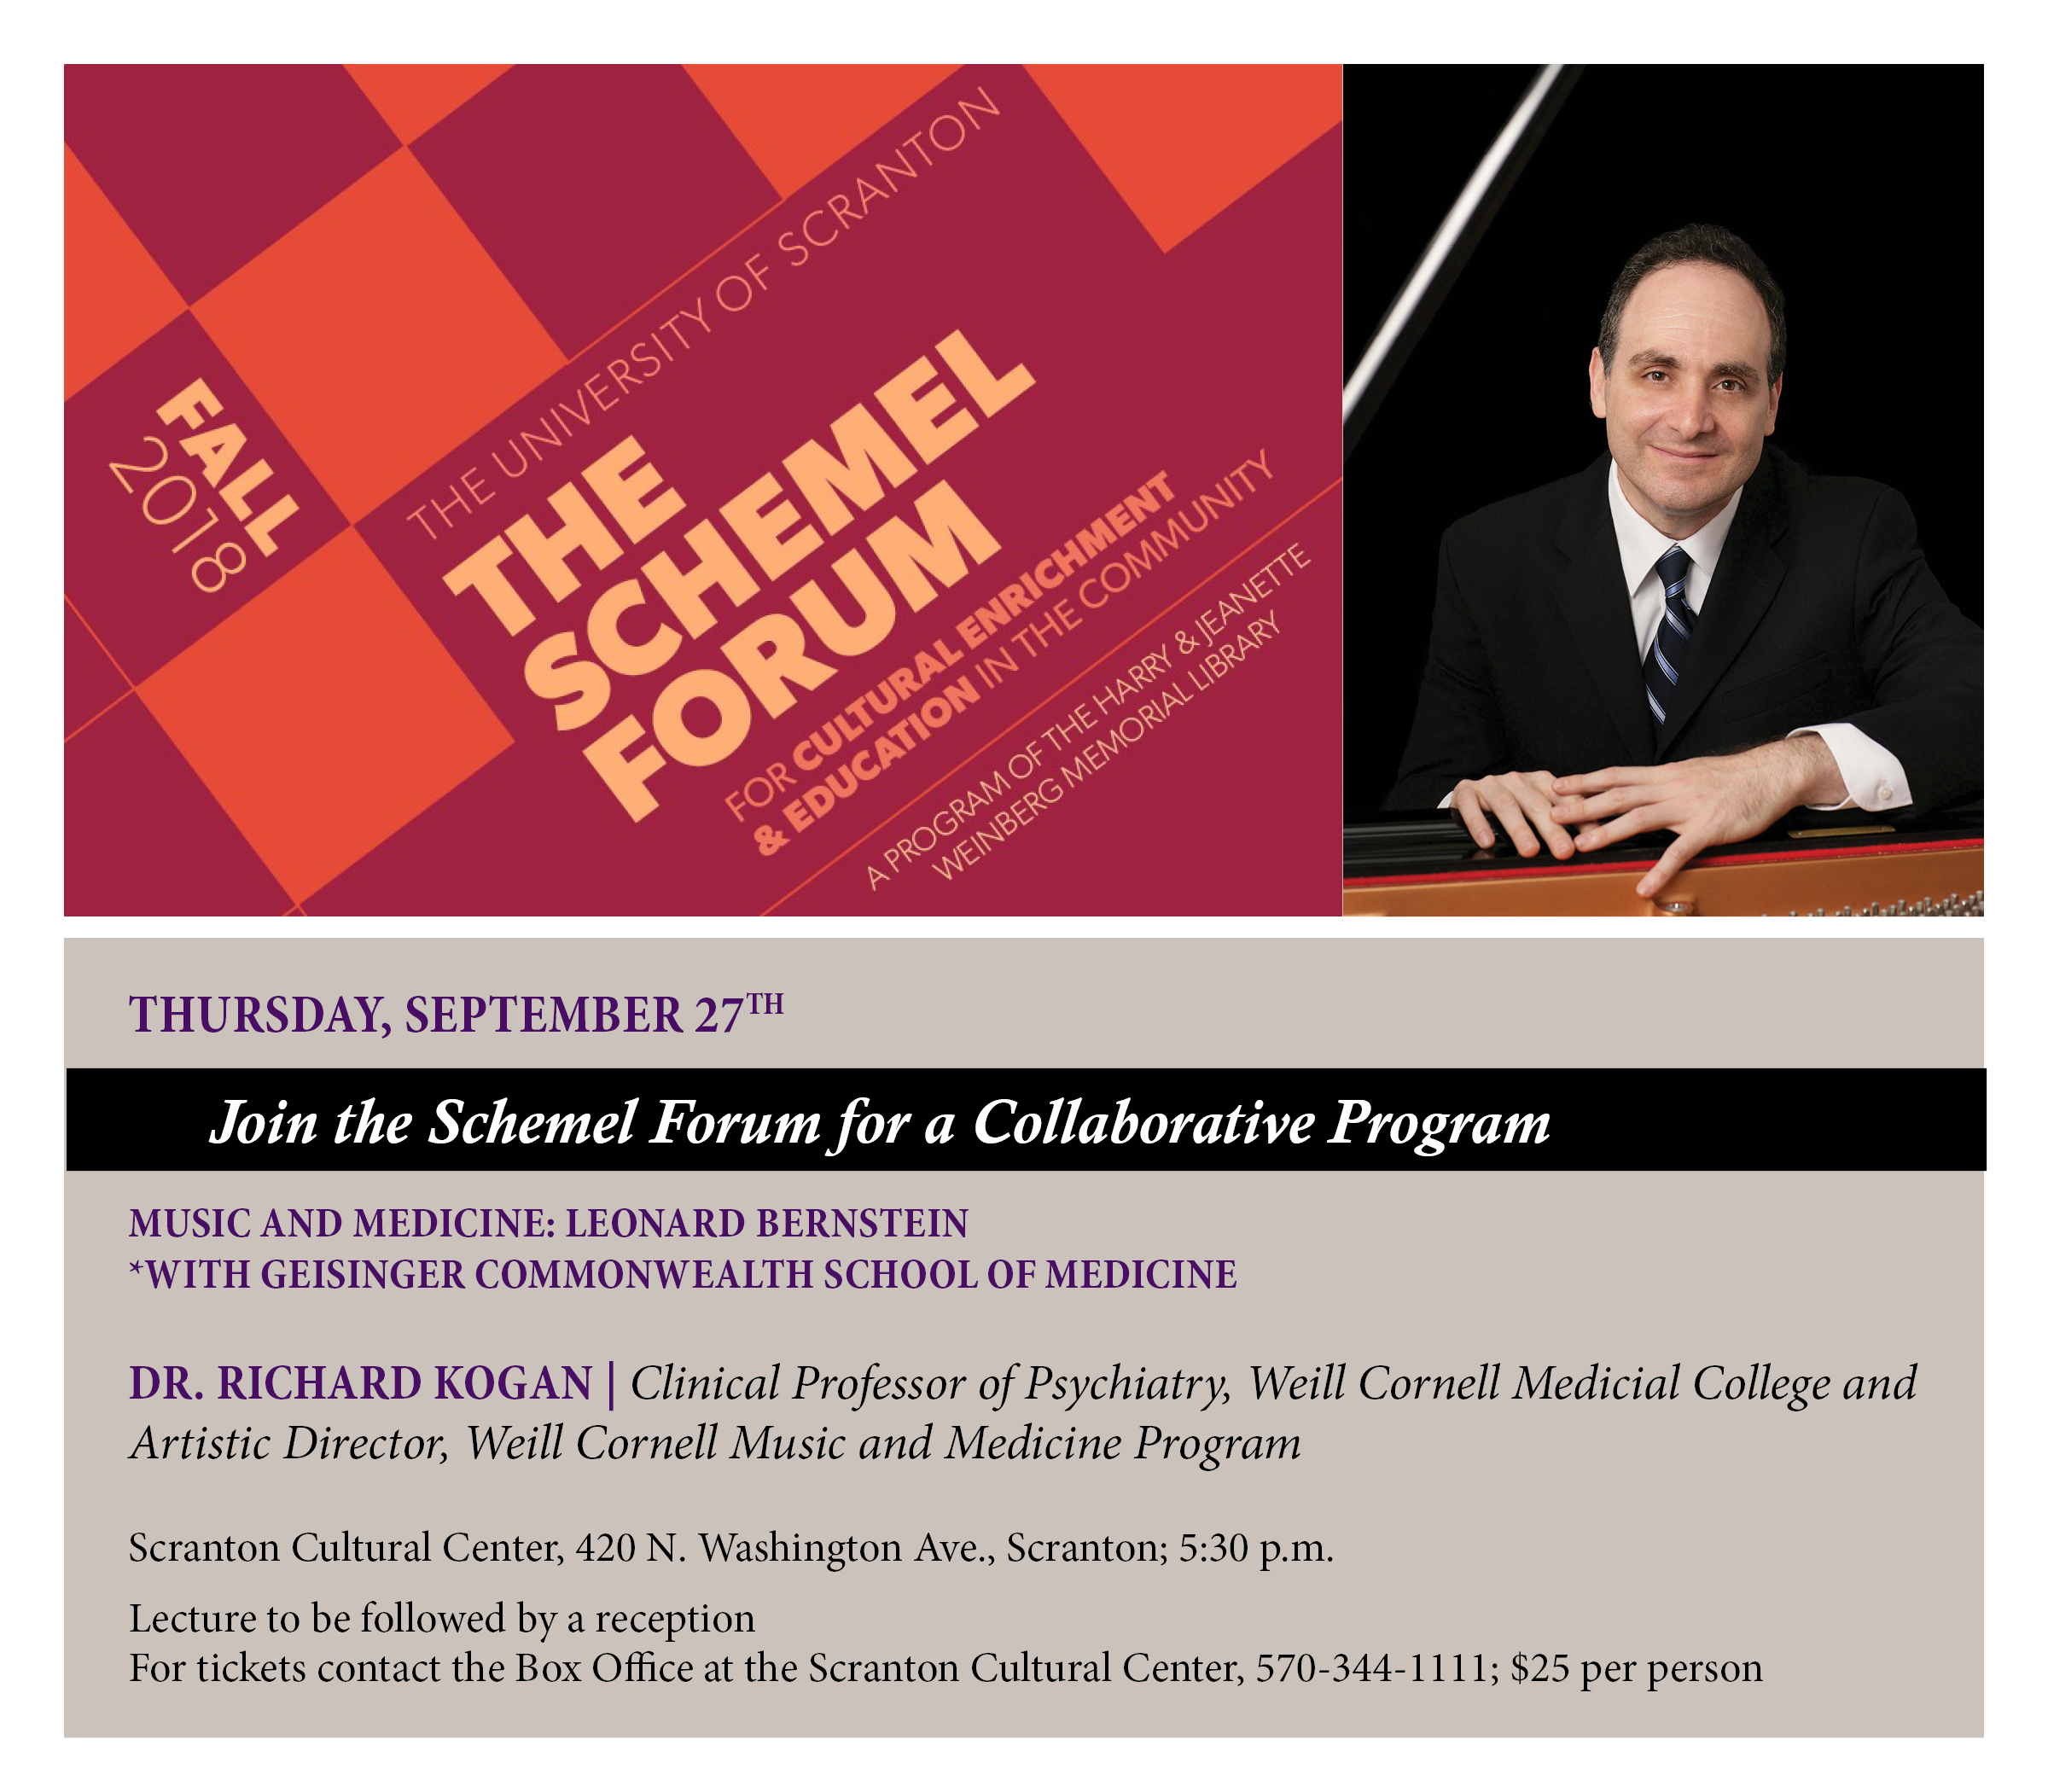 The Schemel Forum with Geisinger Commonwealth School of Medicine